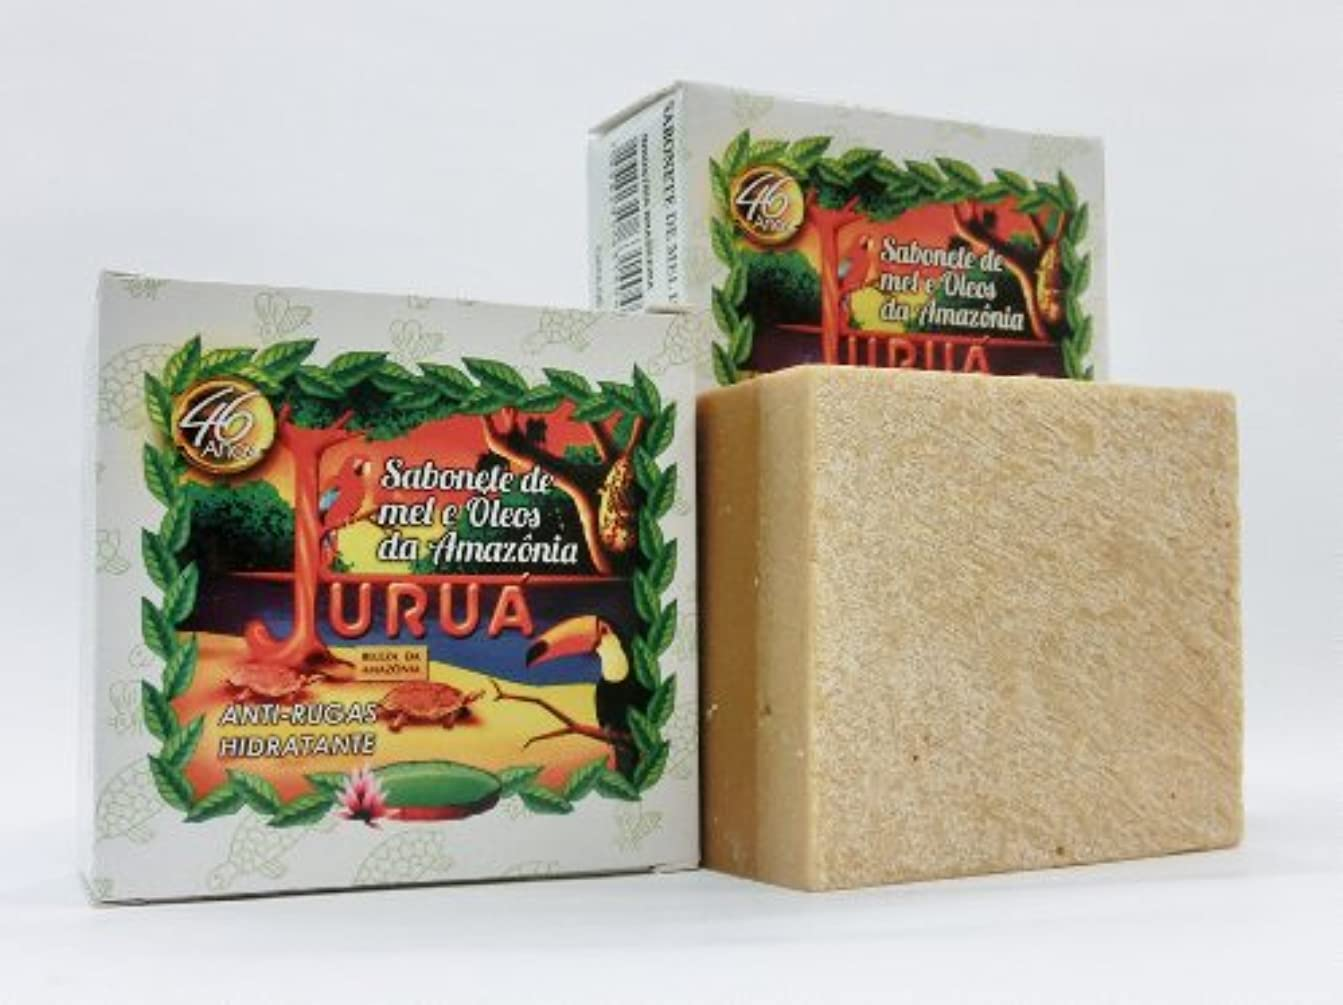 一過性毒液性能JURUA石鹸 (大180g) 2個セット